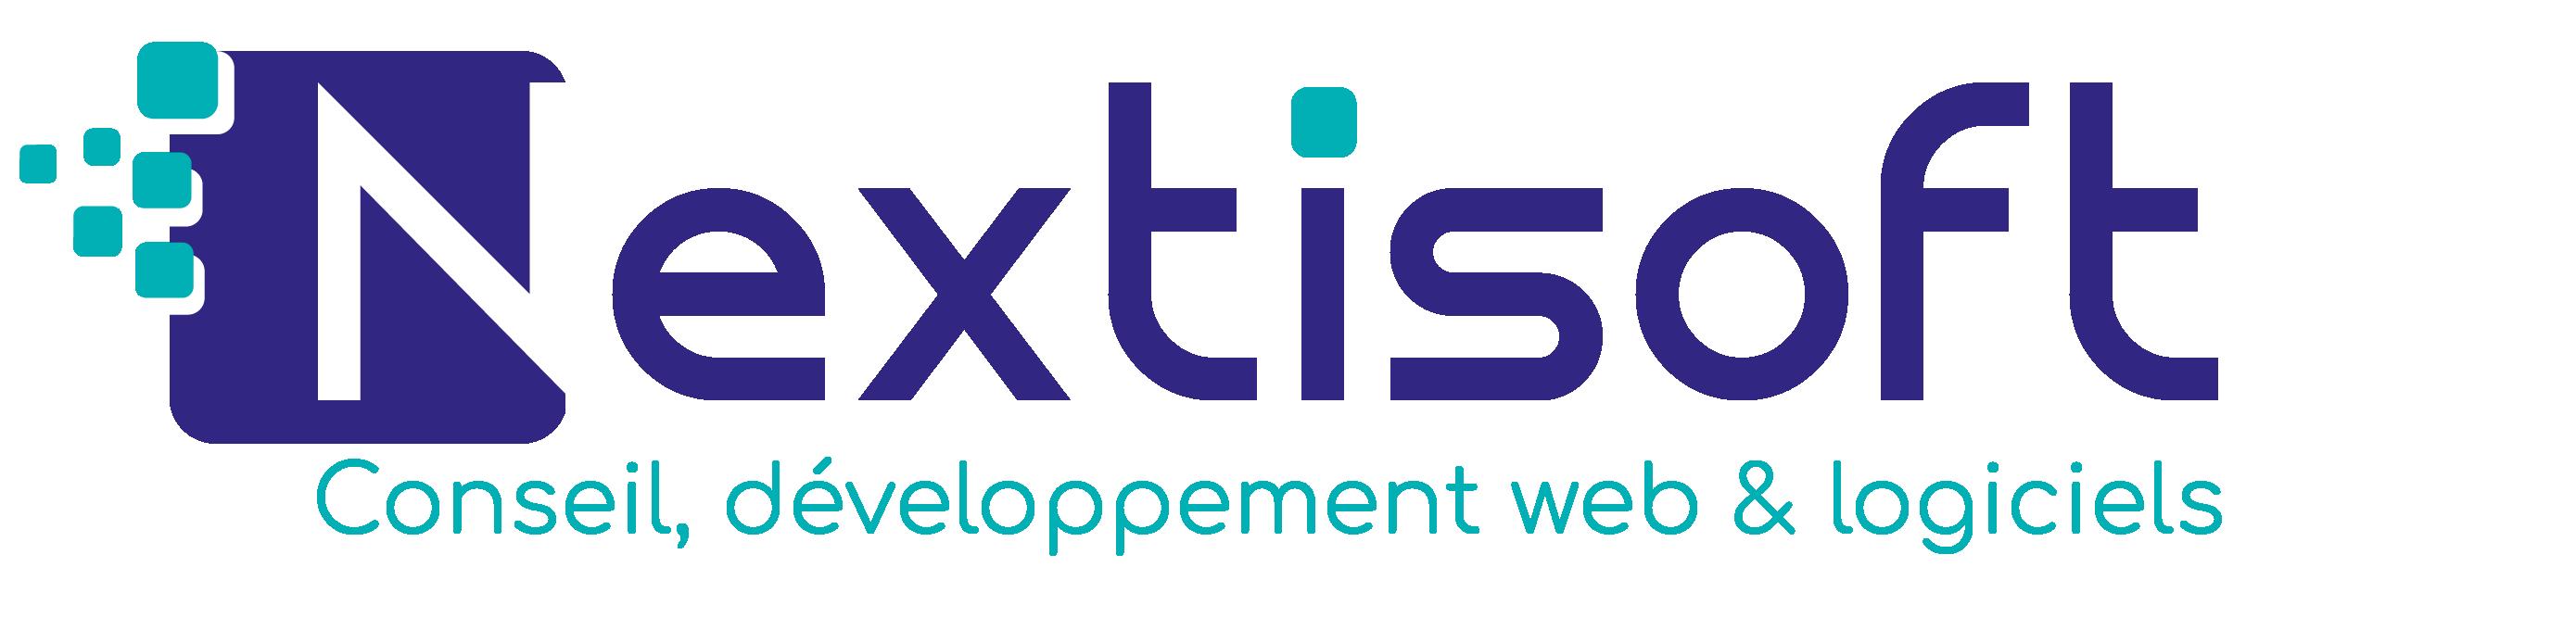 Développement Web - Digital Marketing